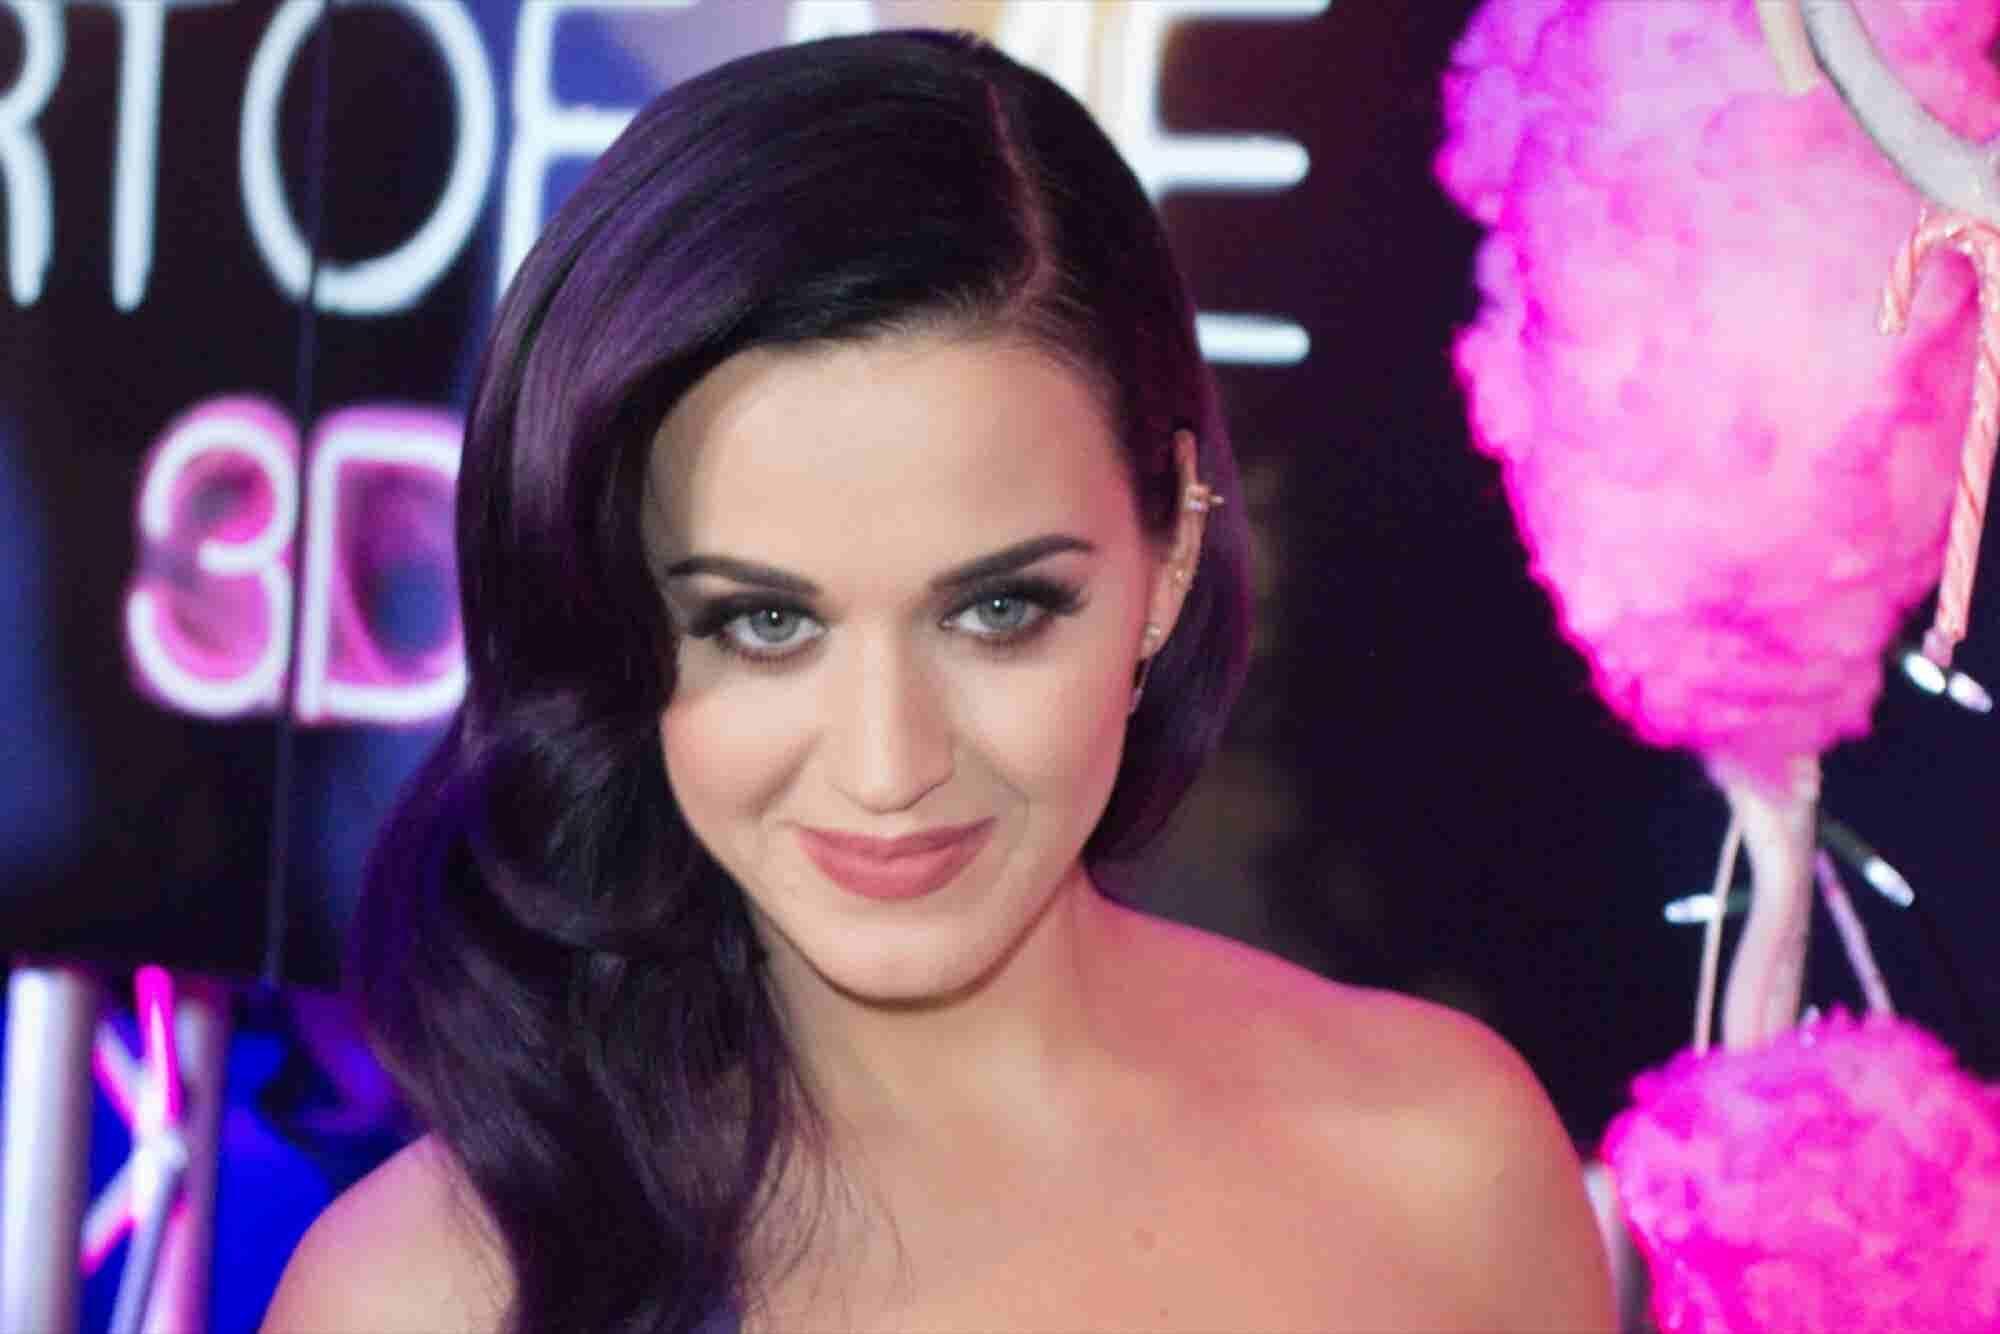 Katy Perry Strikes Mobile Game Deal With Maker of Kim Kardashian's App